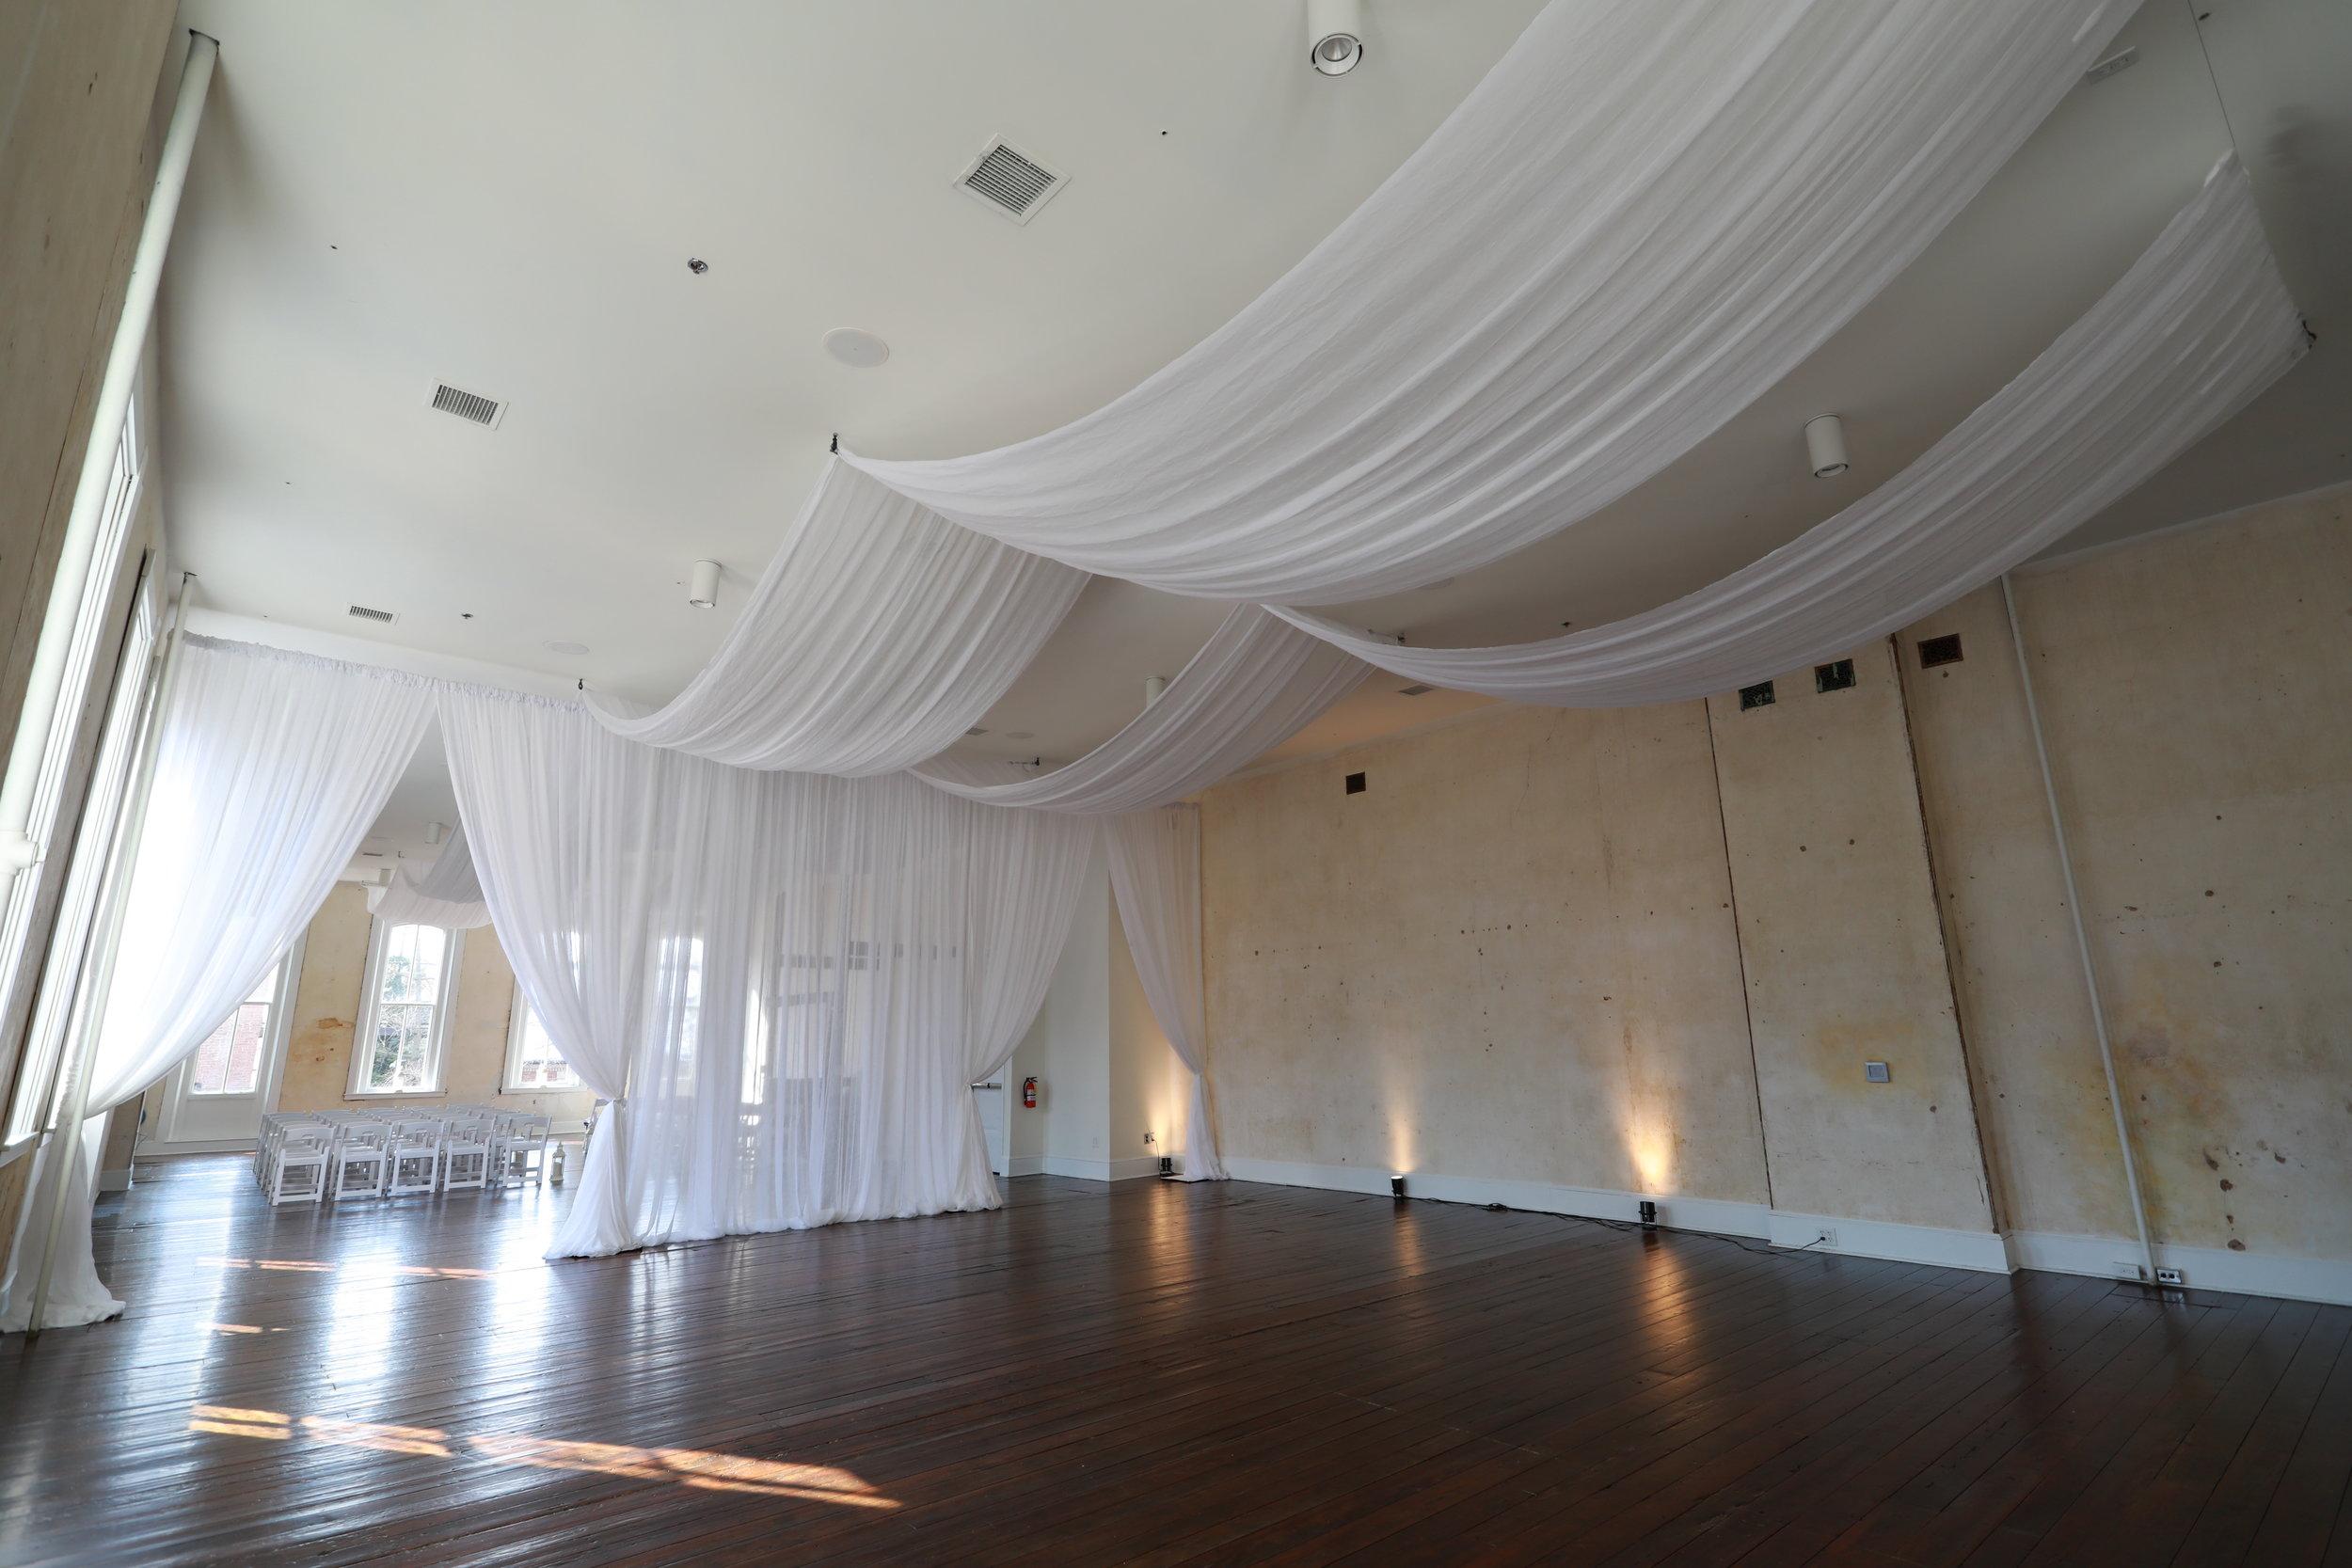 Excelsior Ballroom